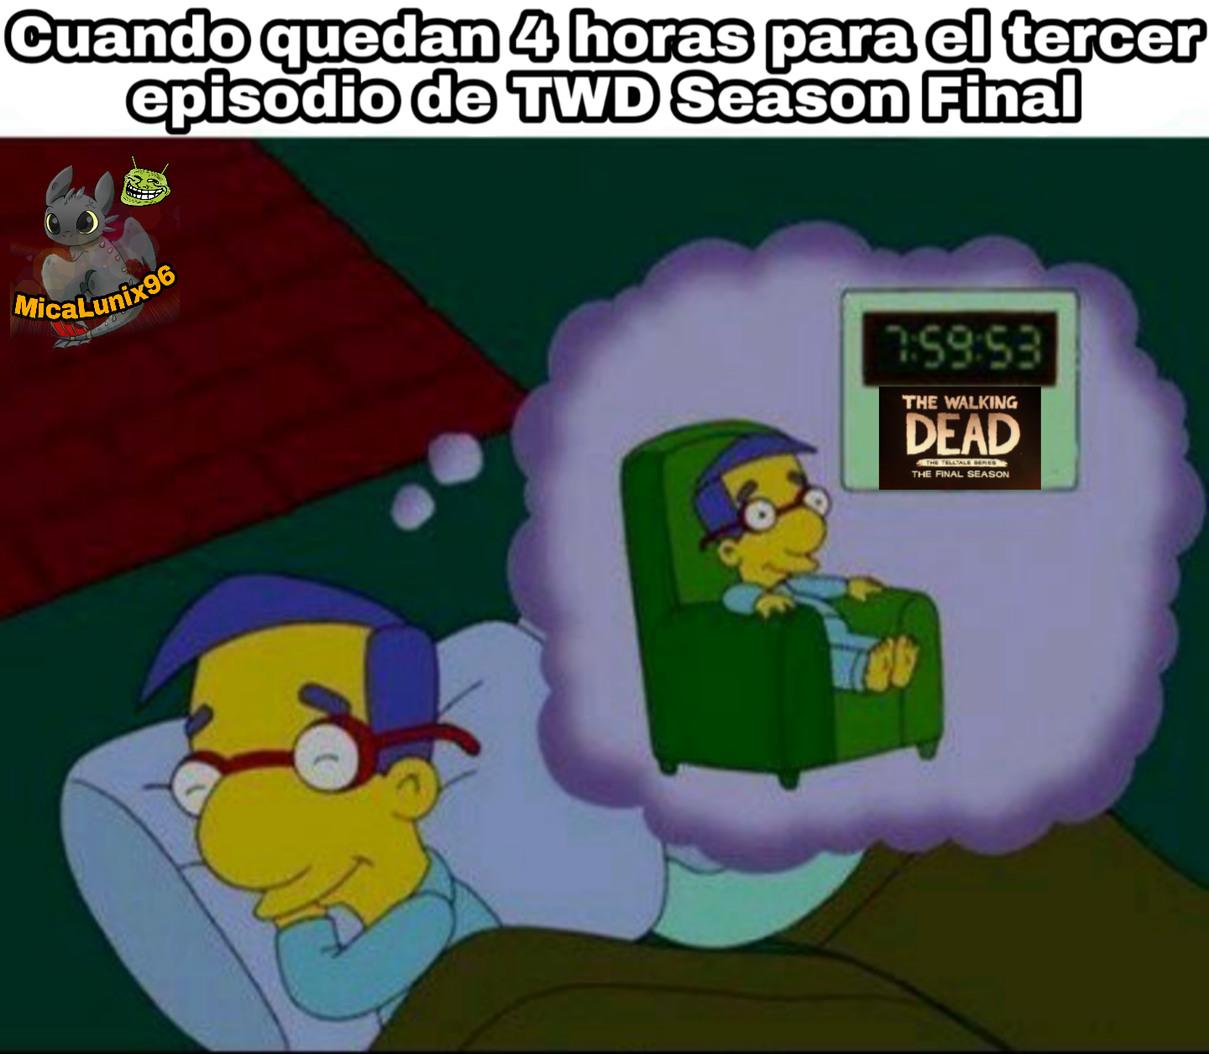 TWD - meme